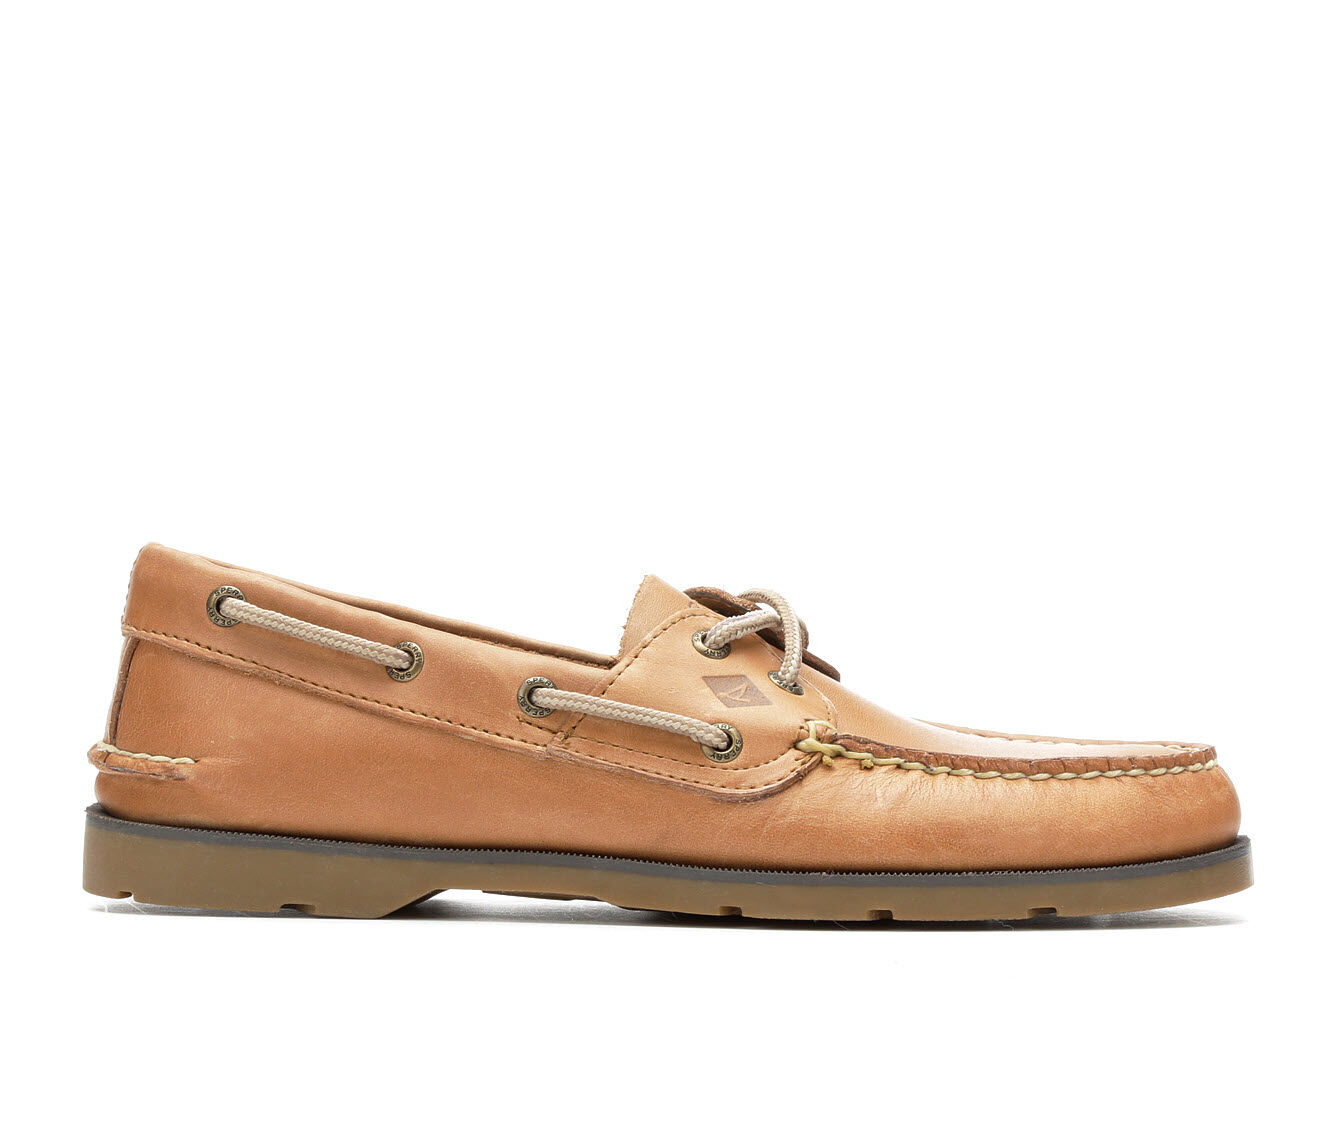 Mens Sperry Leeward 2 Eye Boat Shoes